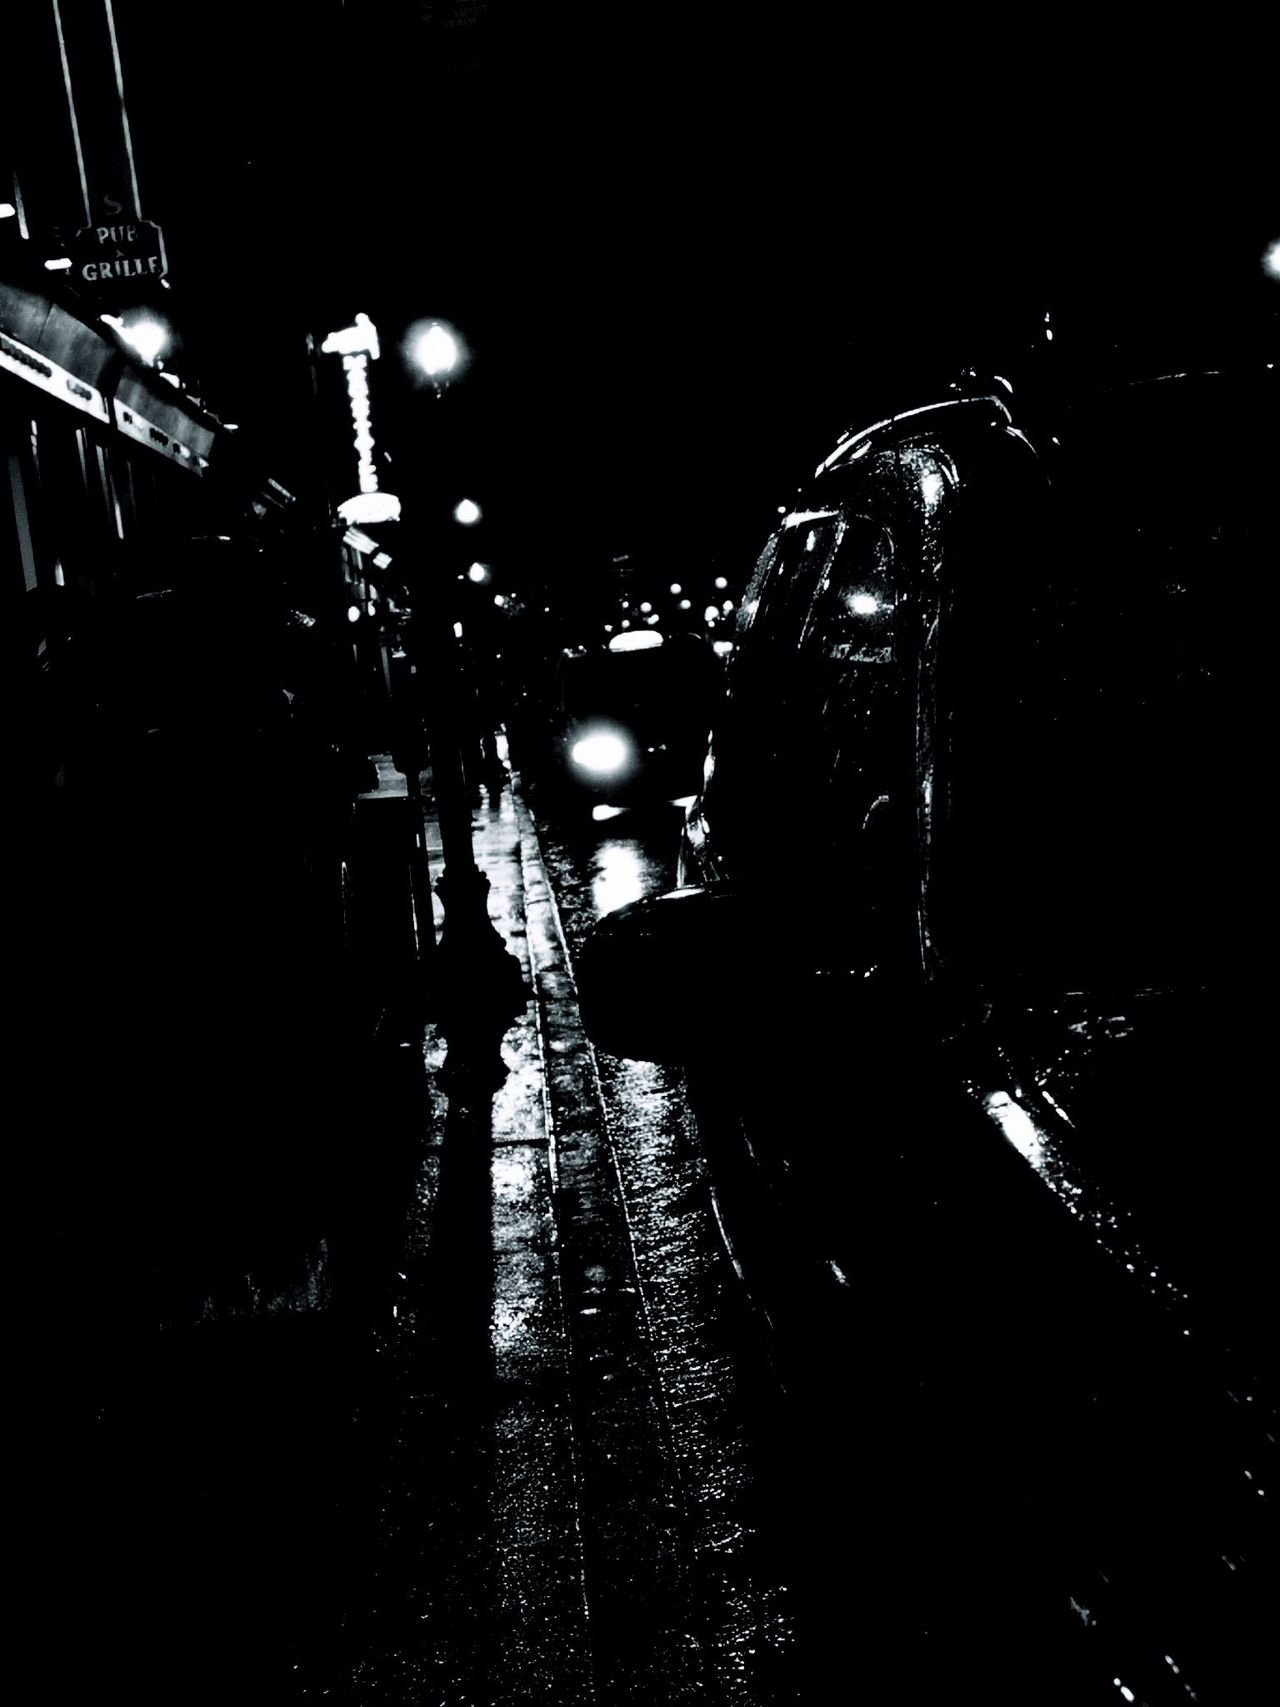 Illuminated Lighting Equipment Night No People Outdoors Sky Stereo Streert Streetart Water